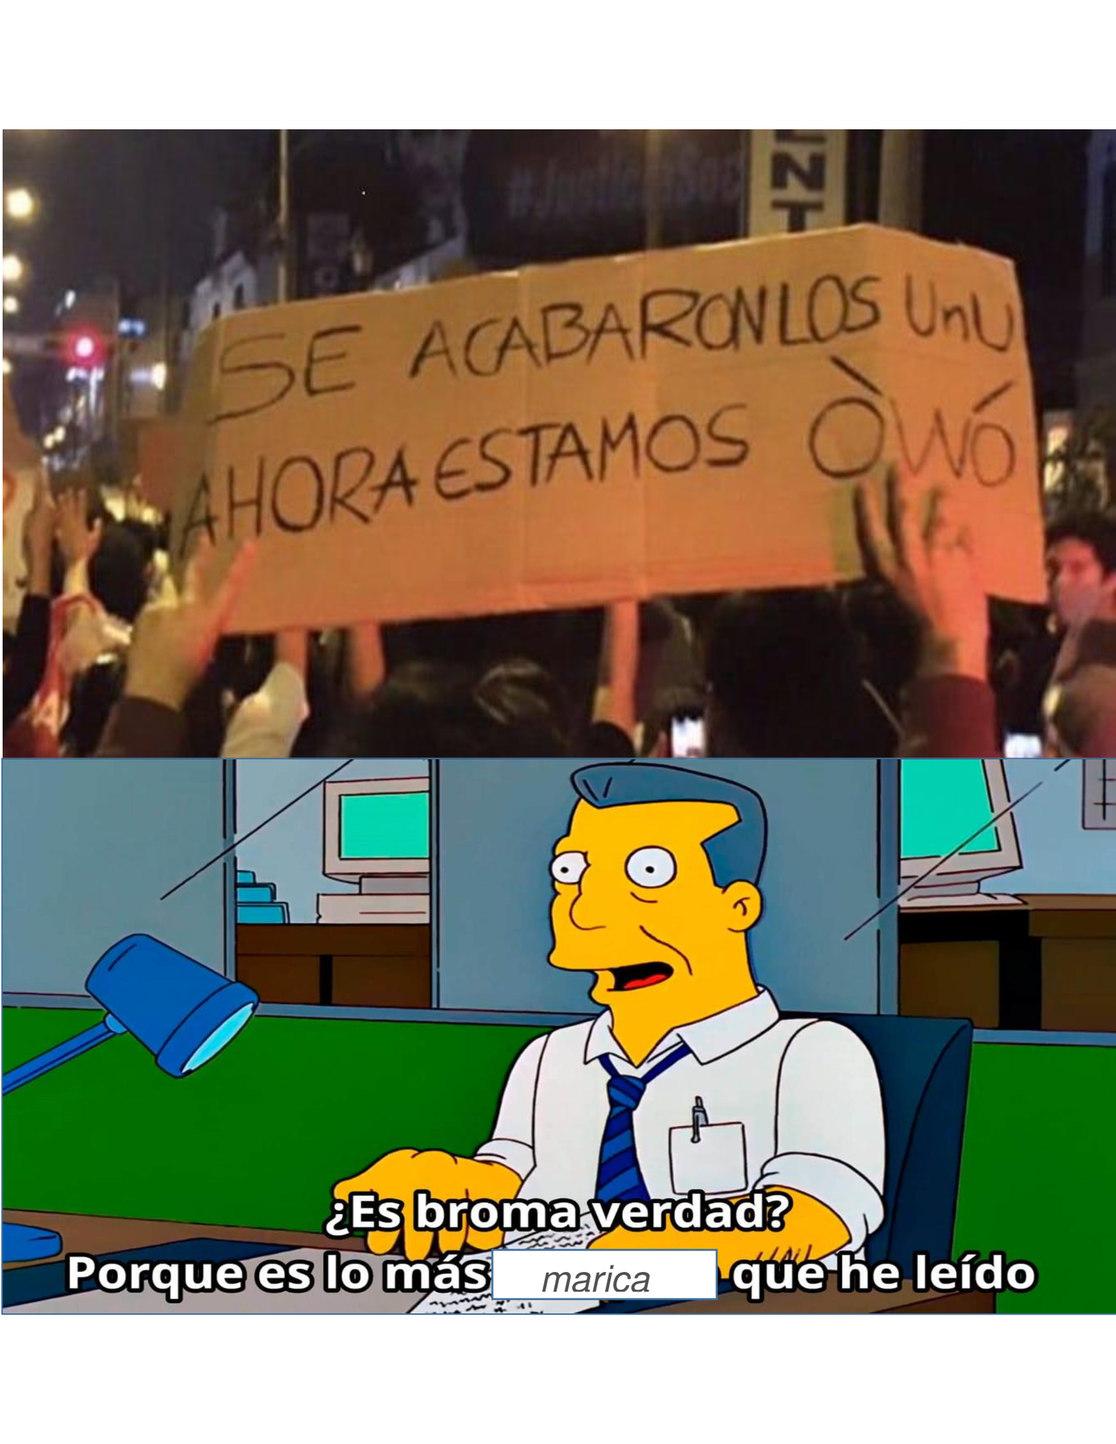 Manifestantes trolos manifestantes trolos - meme